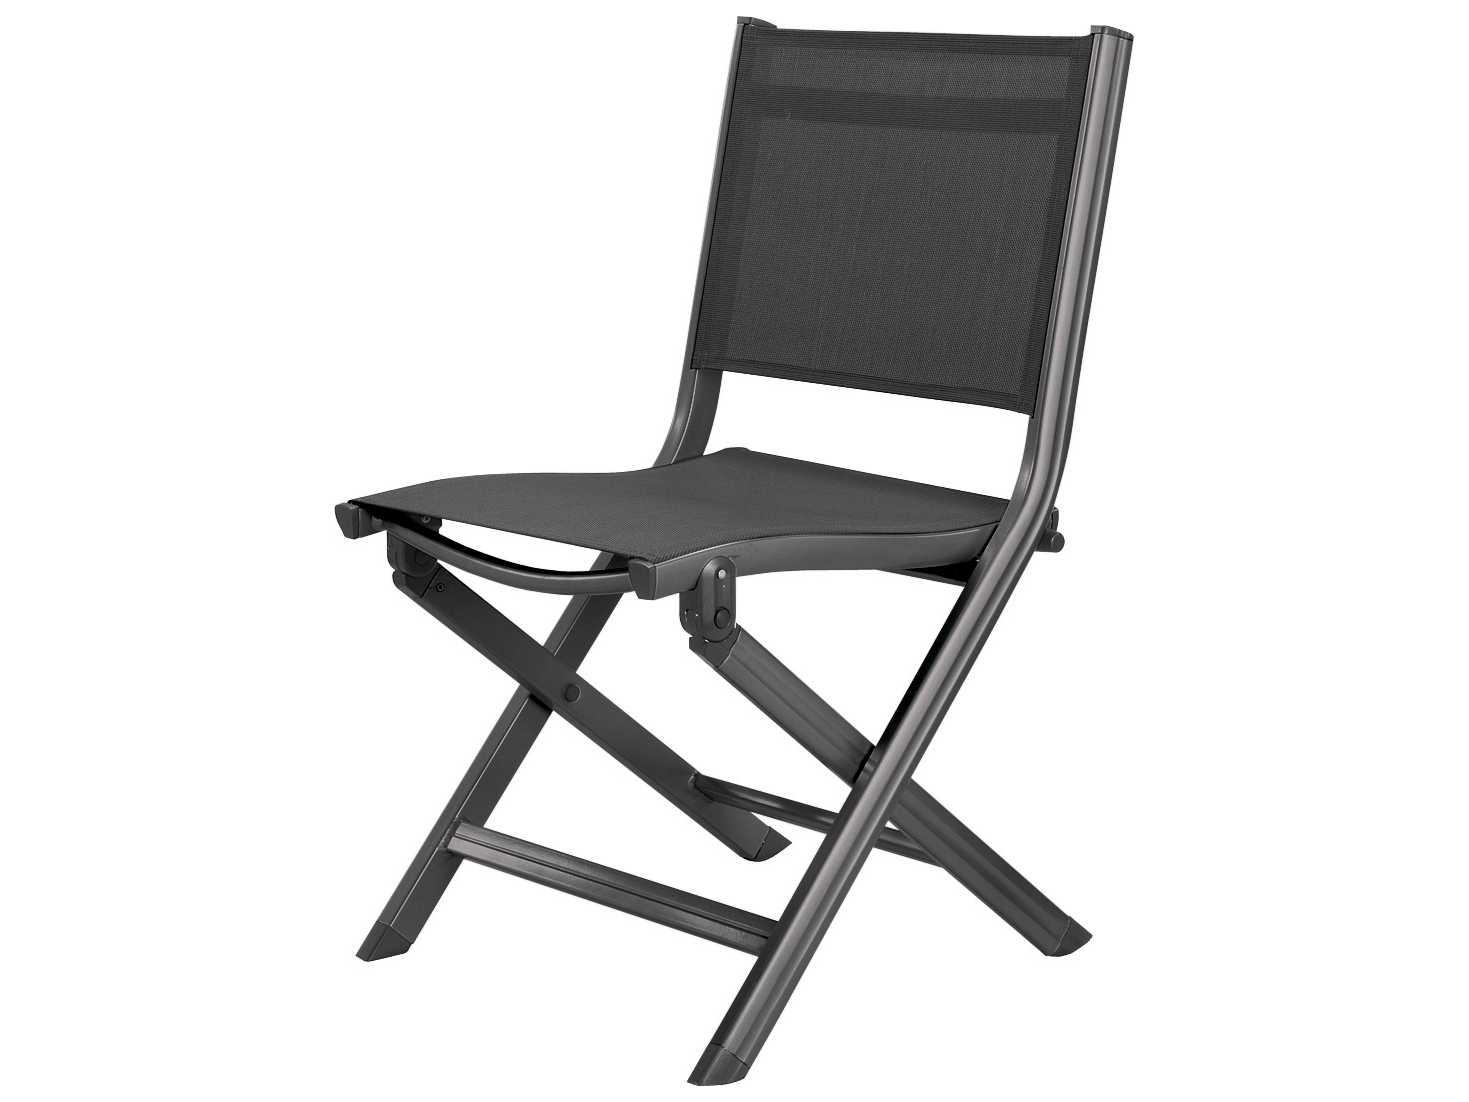 kettler basic plus folding side chair gray gray 301218 7000. Black Bedroom Furniture Sets. Home Design Ideas